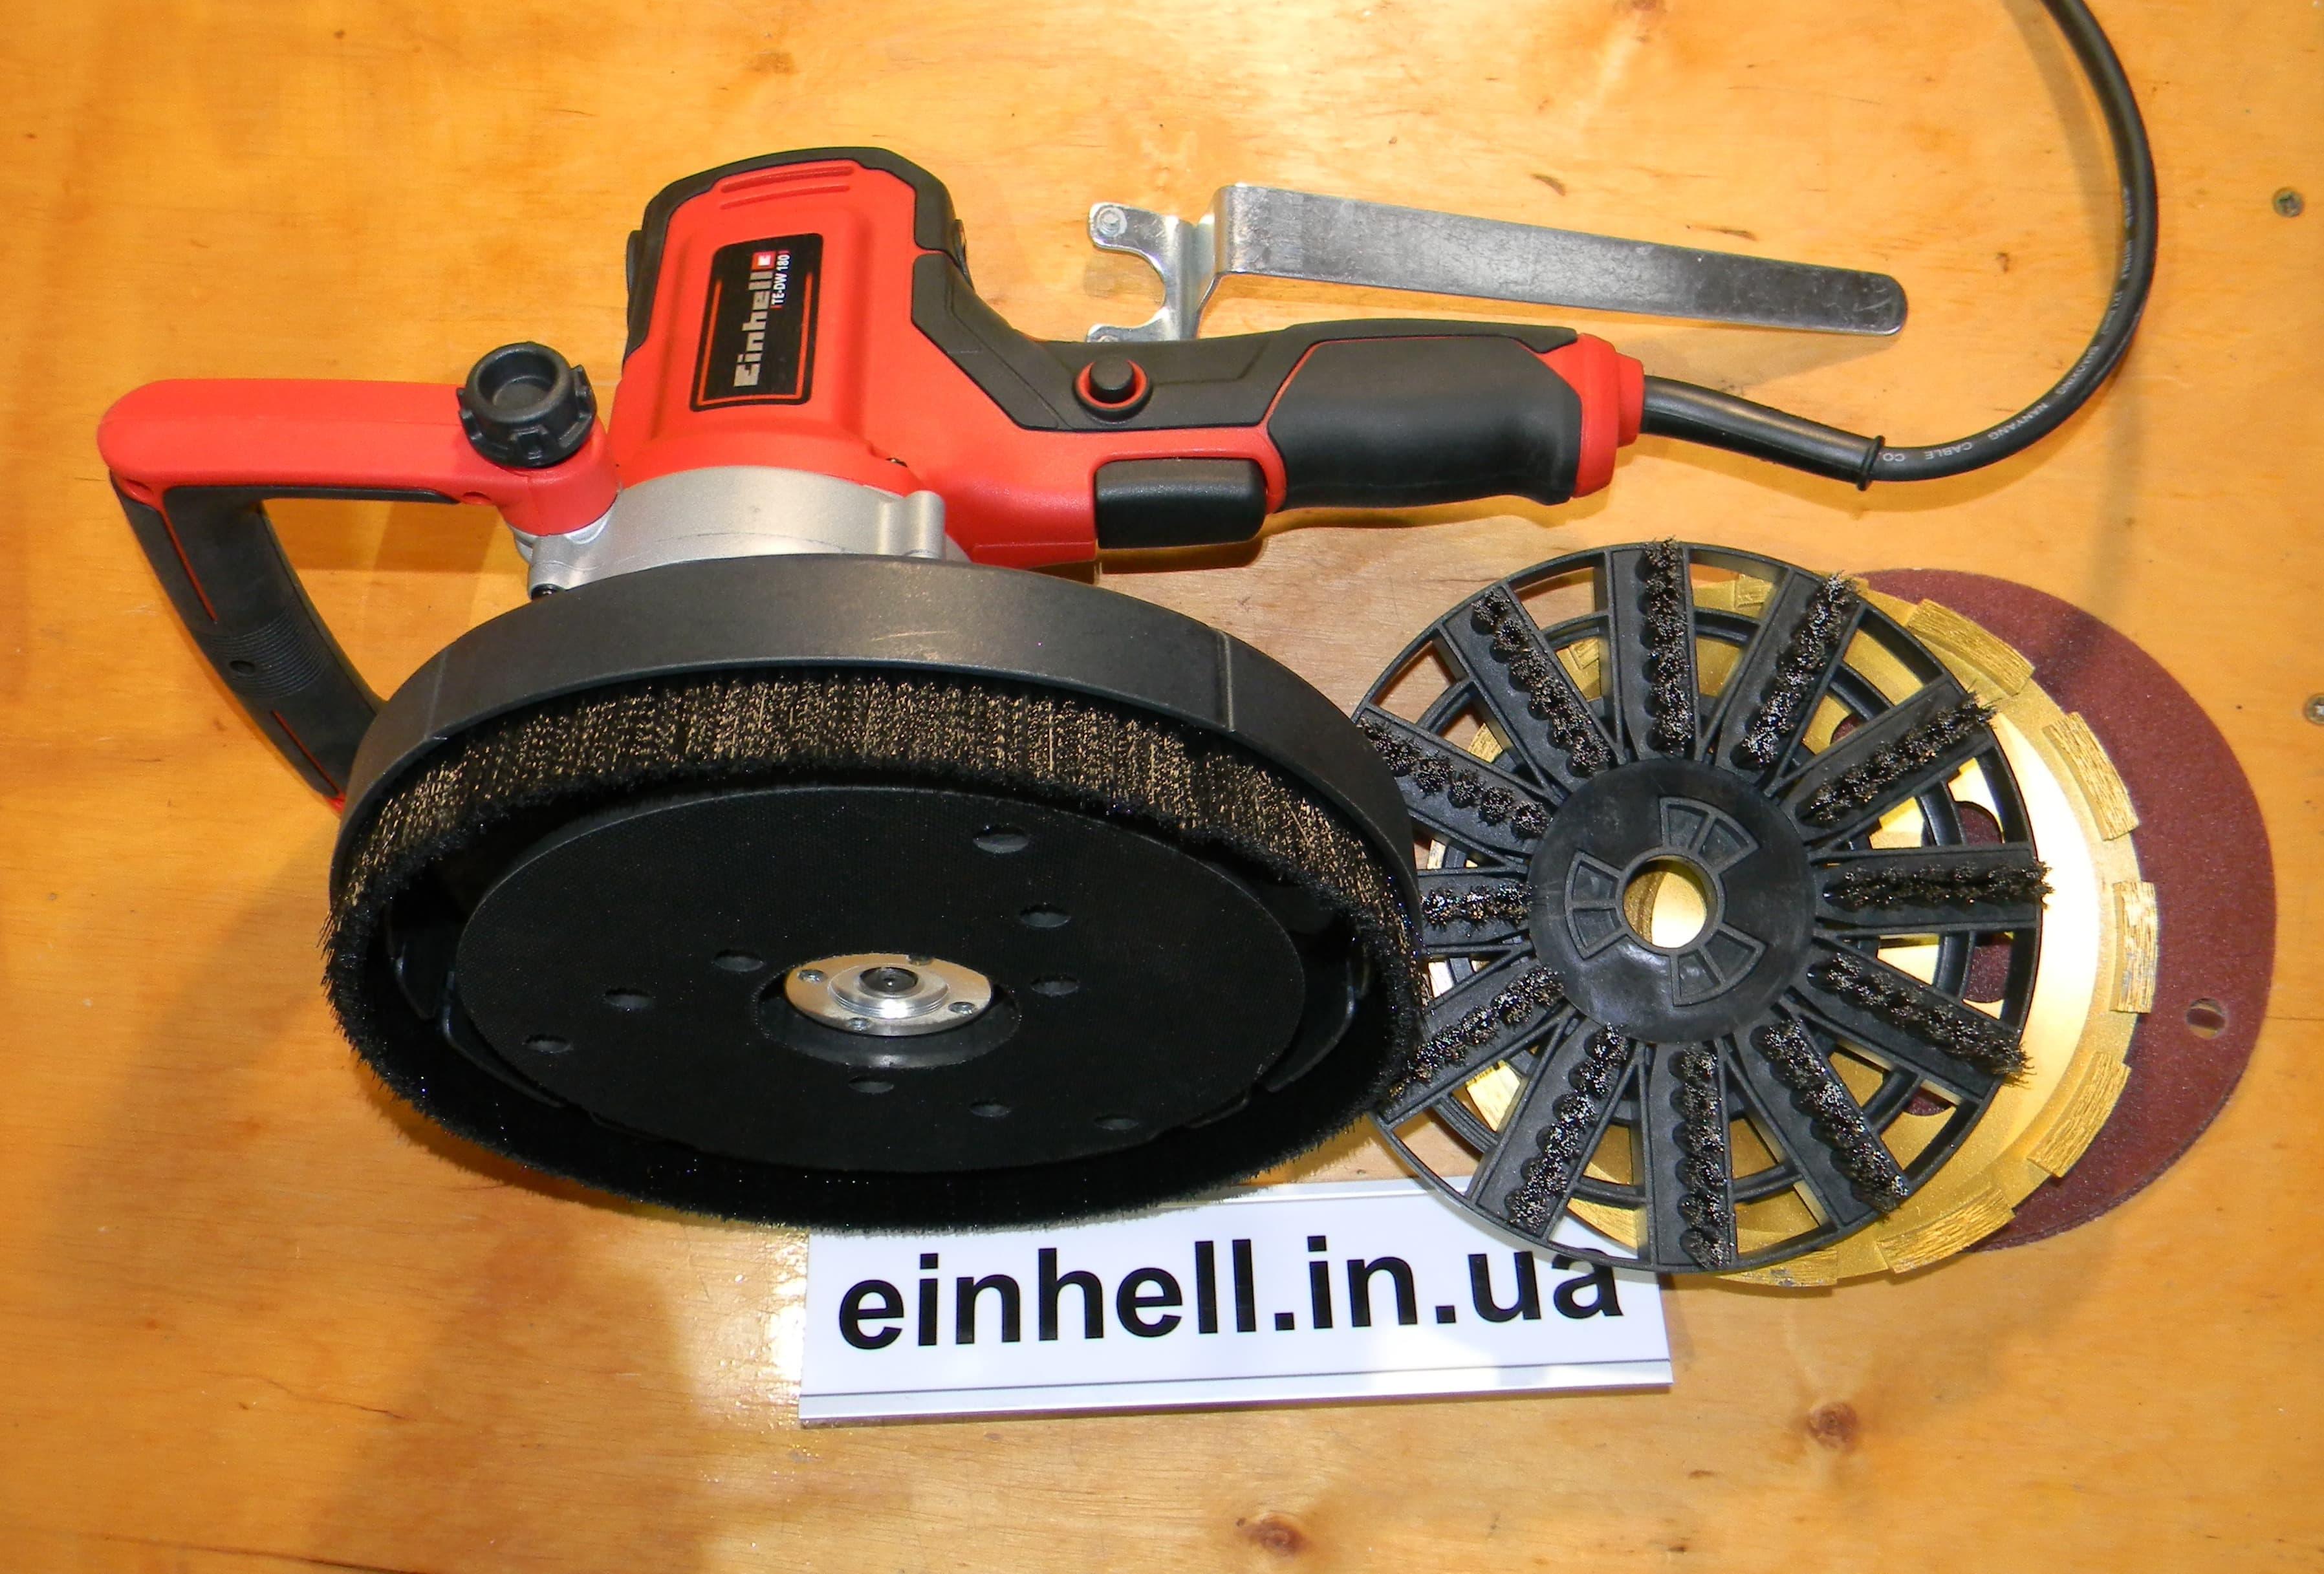 Einhell TE-DW 180 (1)